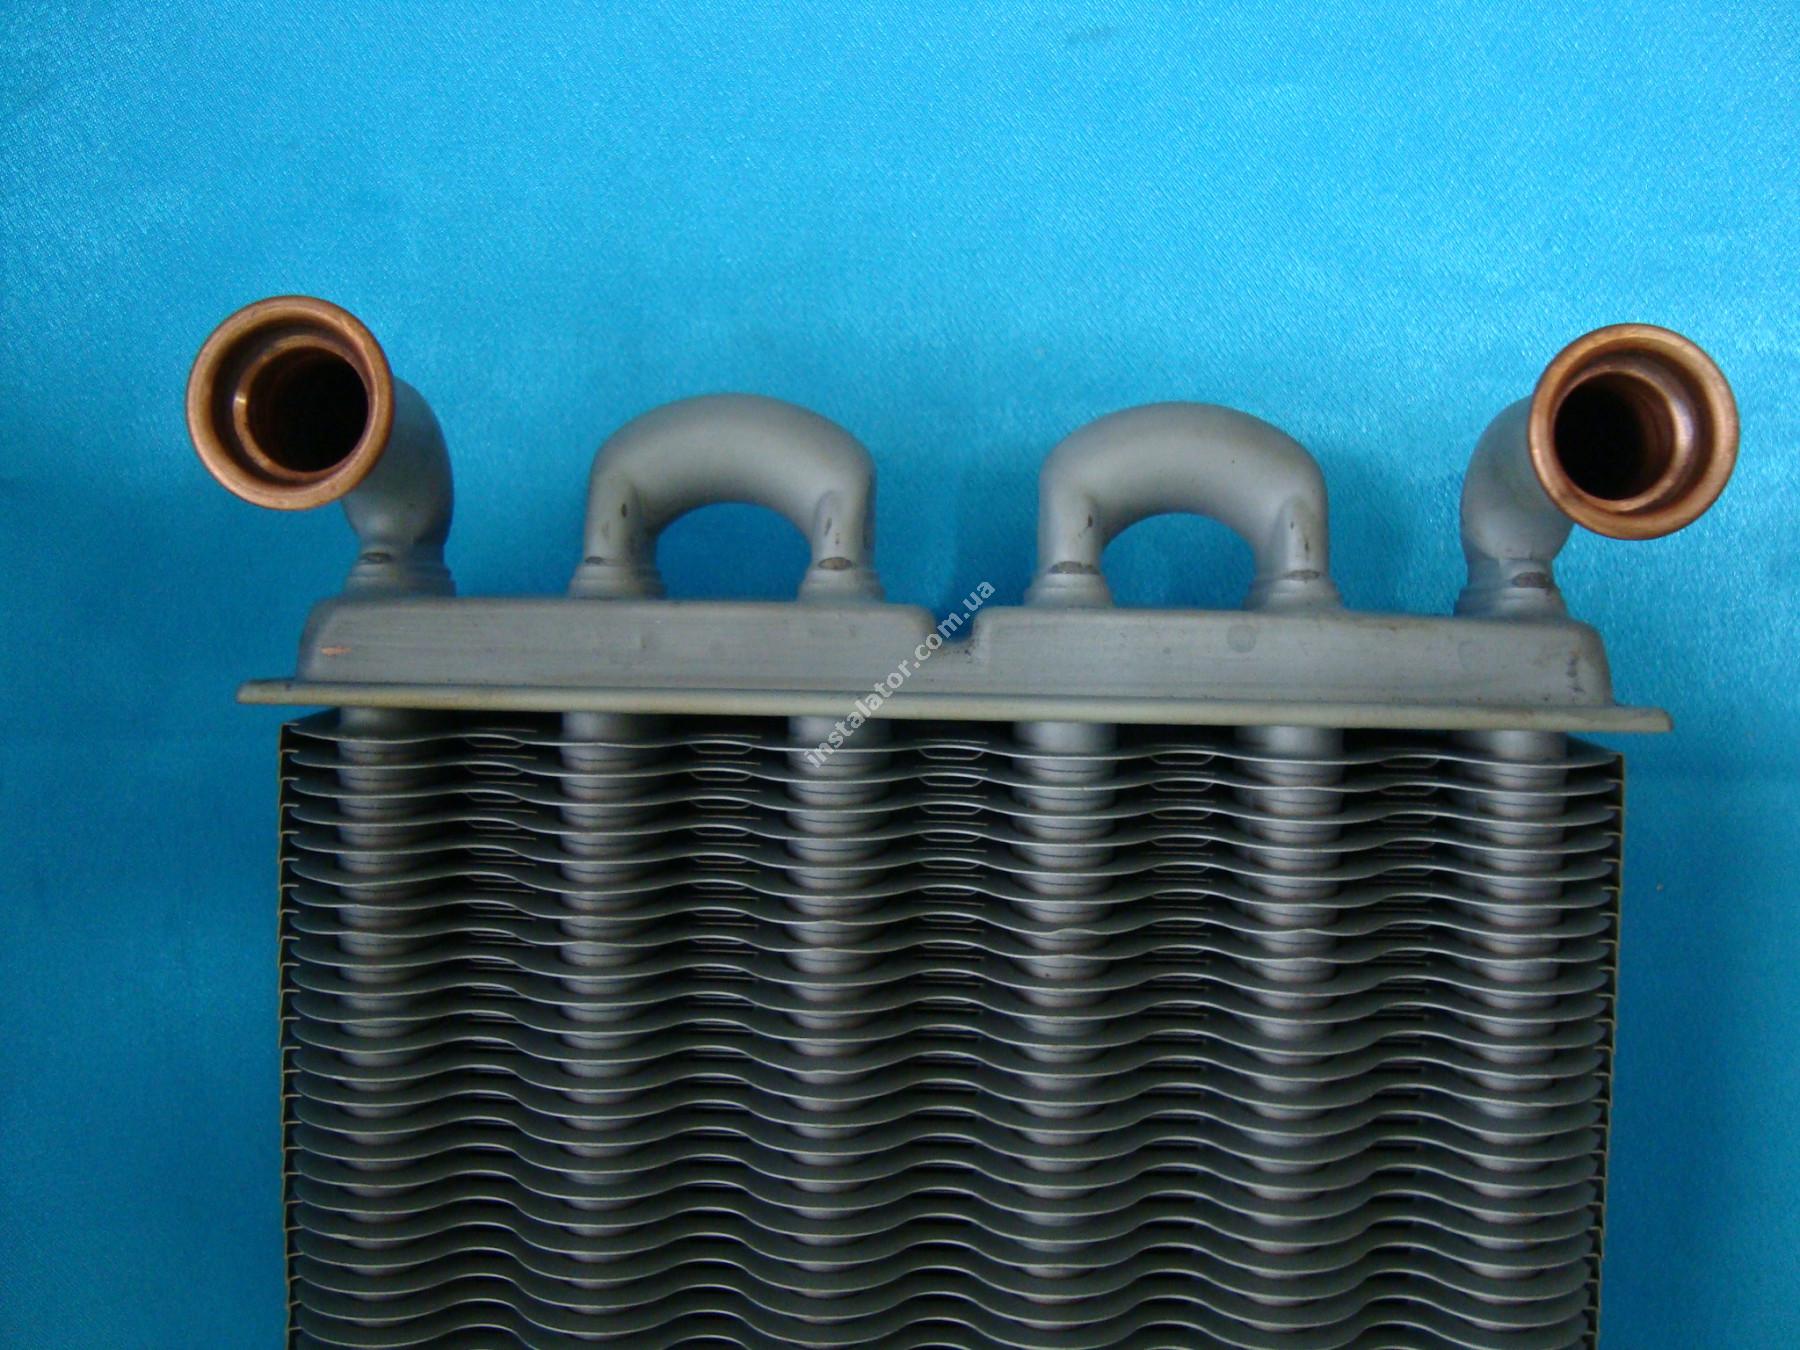 39820060 Теплообменник битермический  Ferroli DOMIPROJECT C24, FerEasy C24 (дым) full-image-1